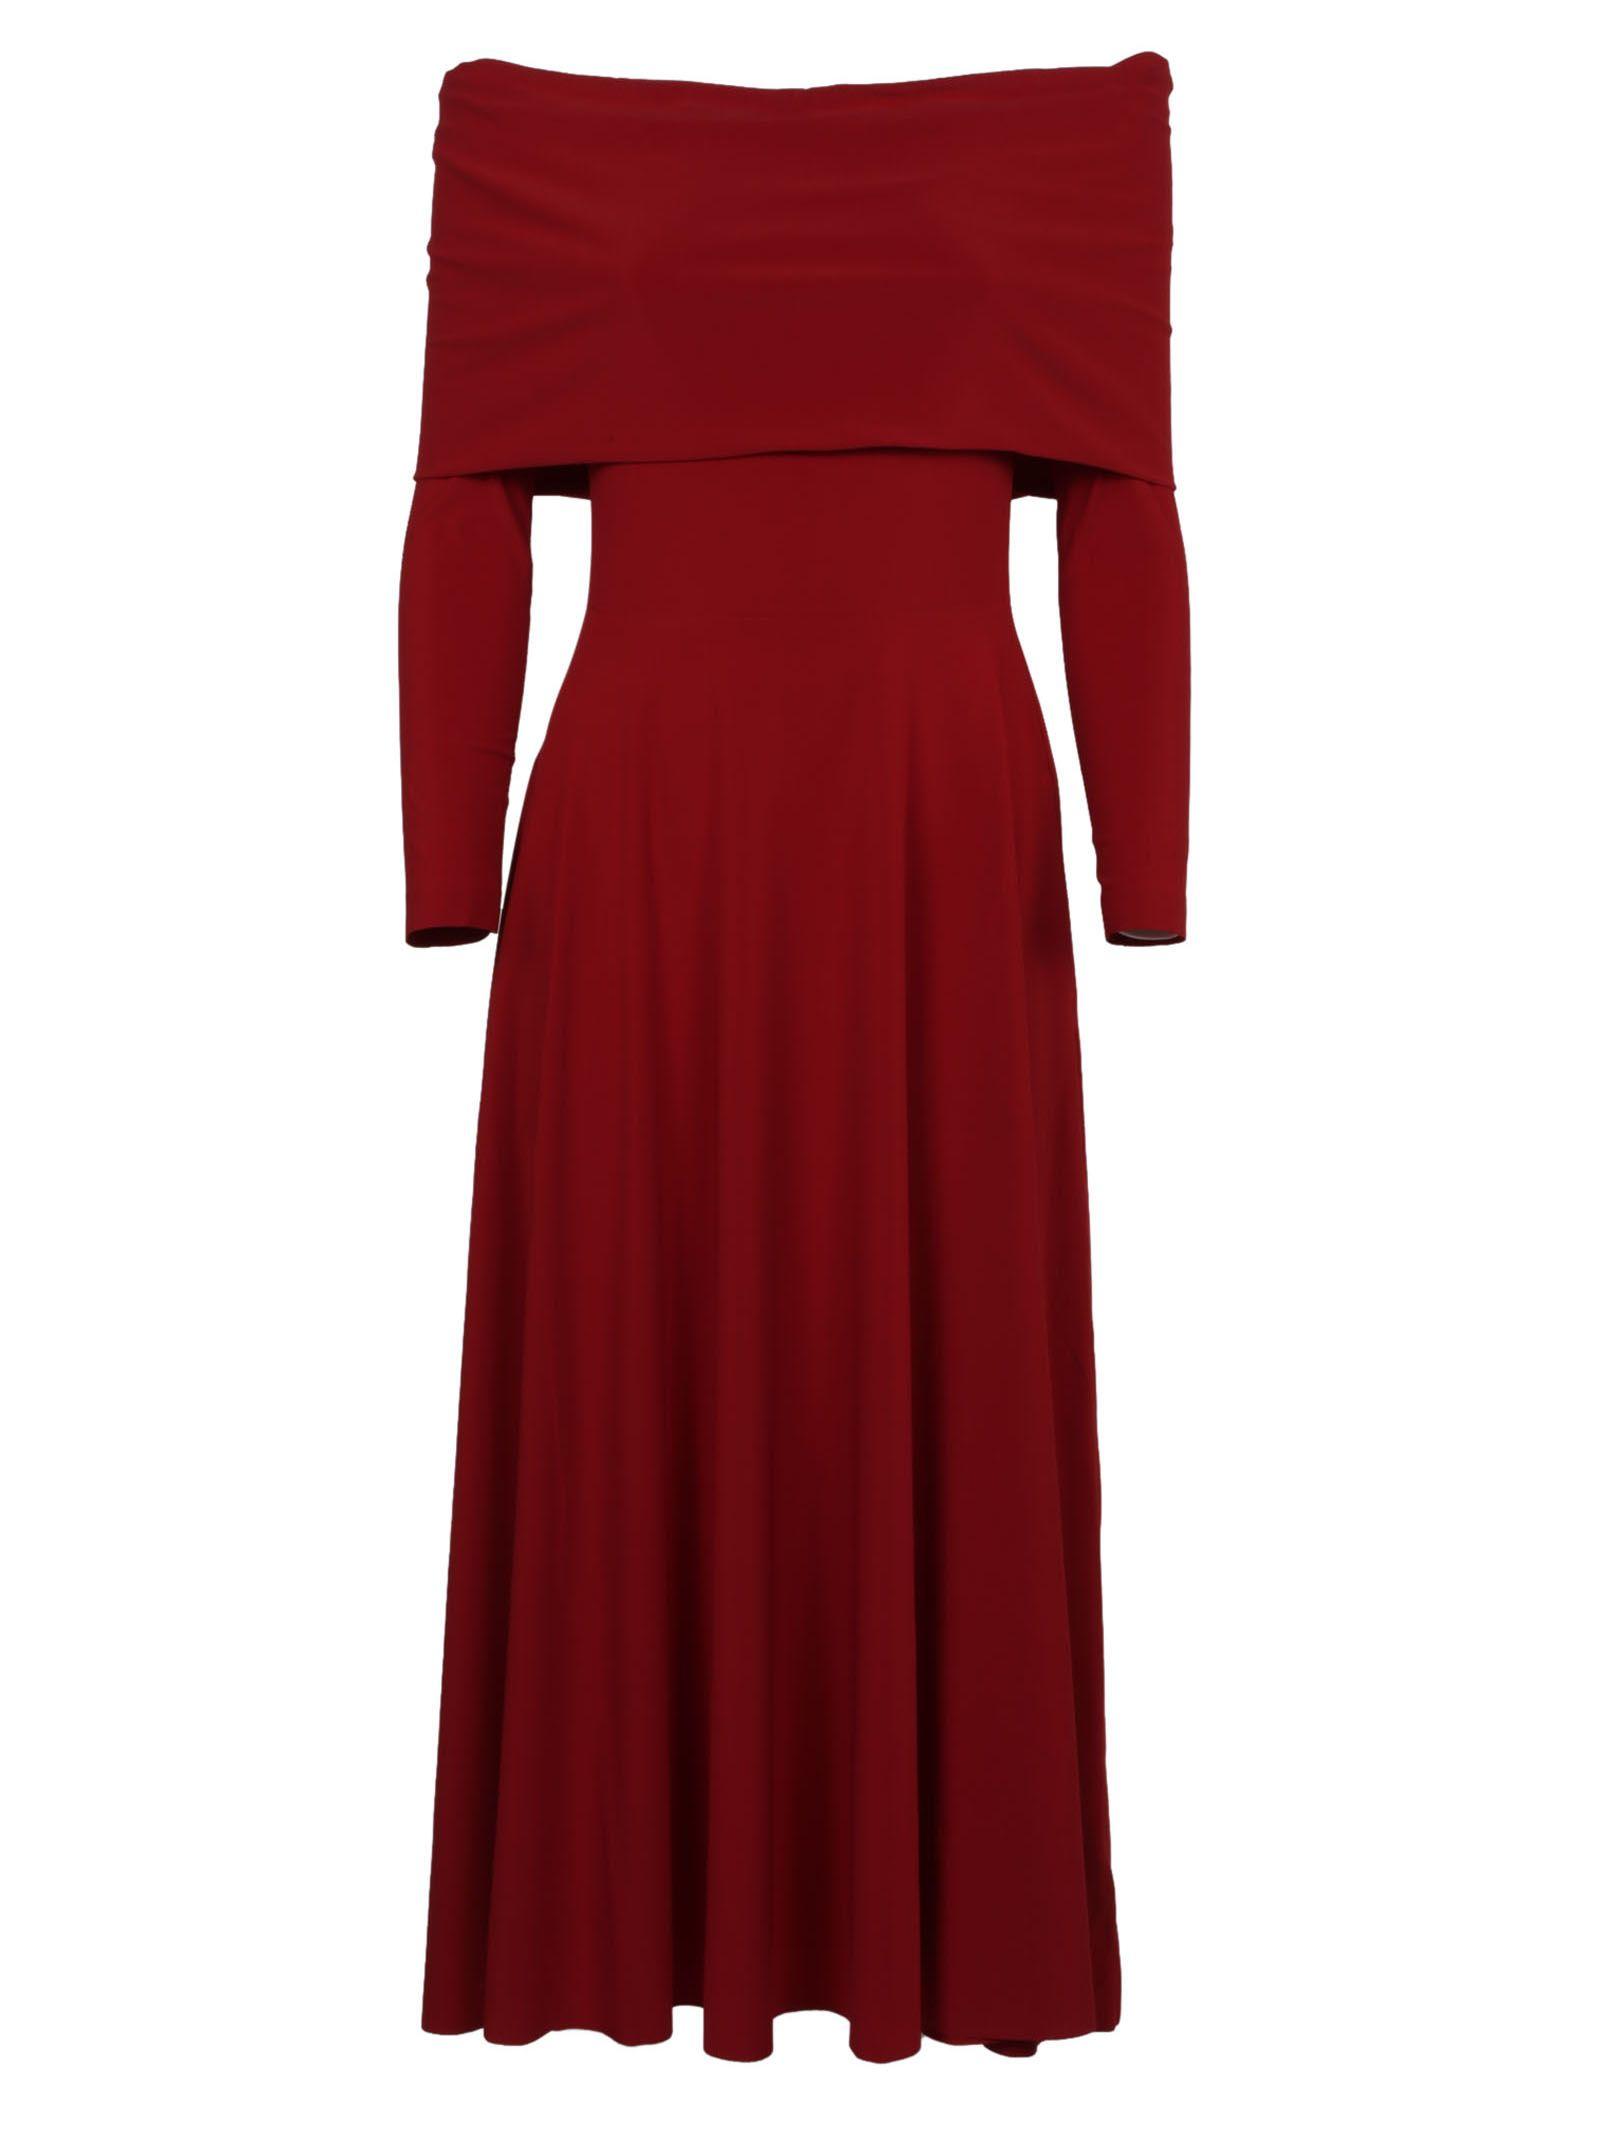 Norma Kamali Cowl Neck Flared Dress